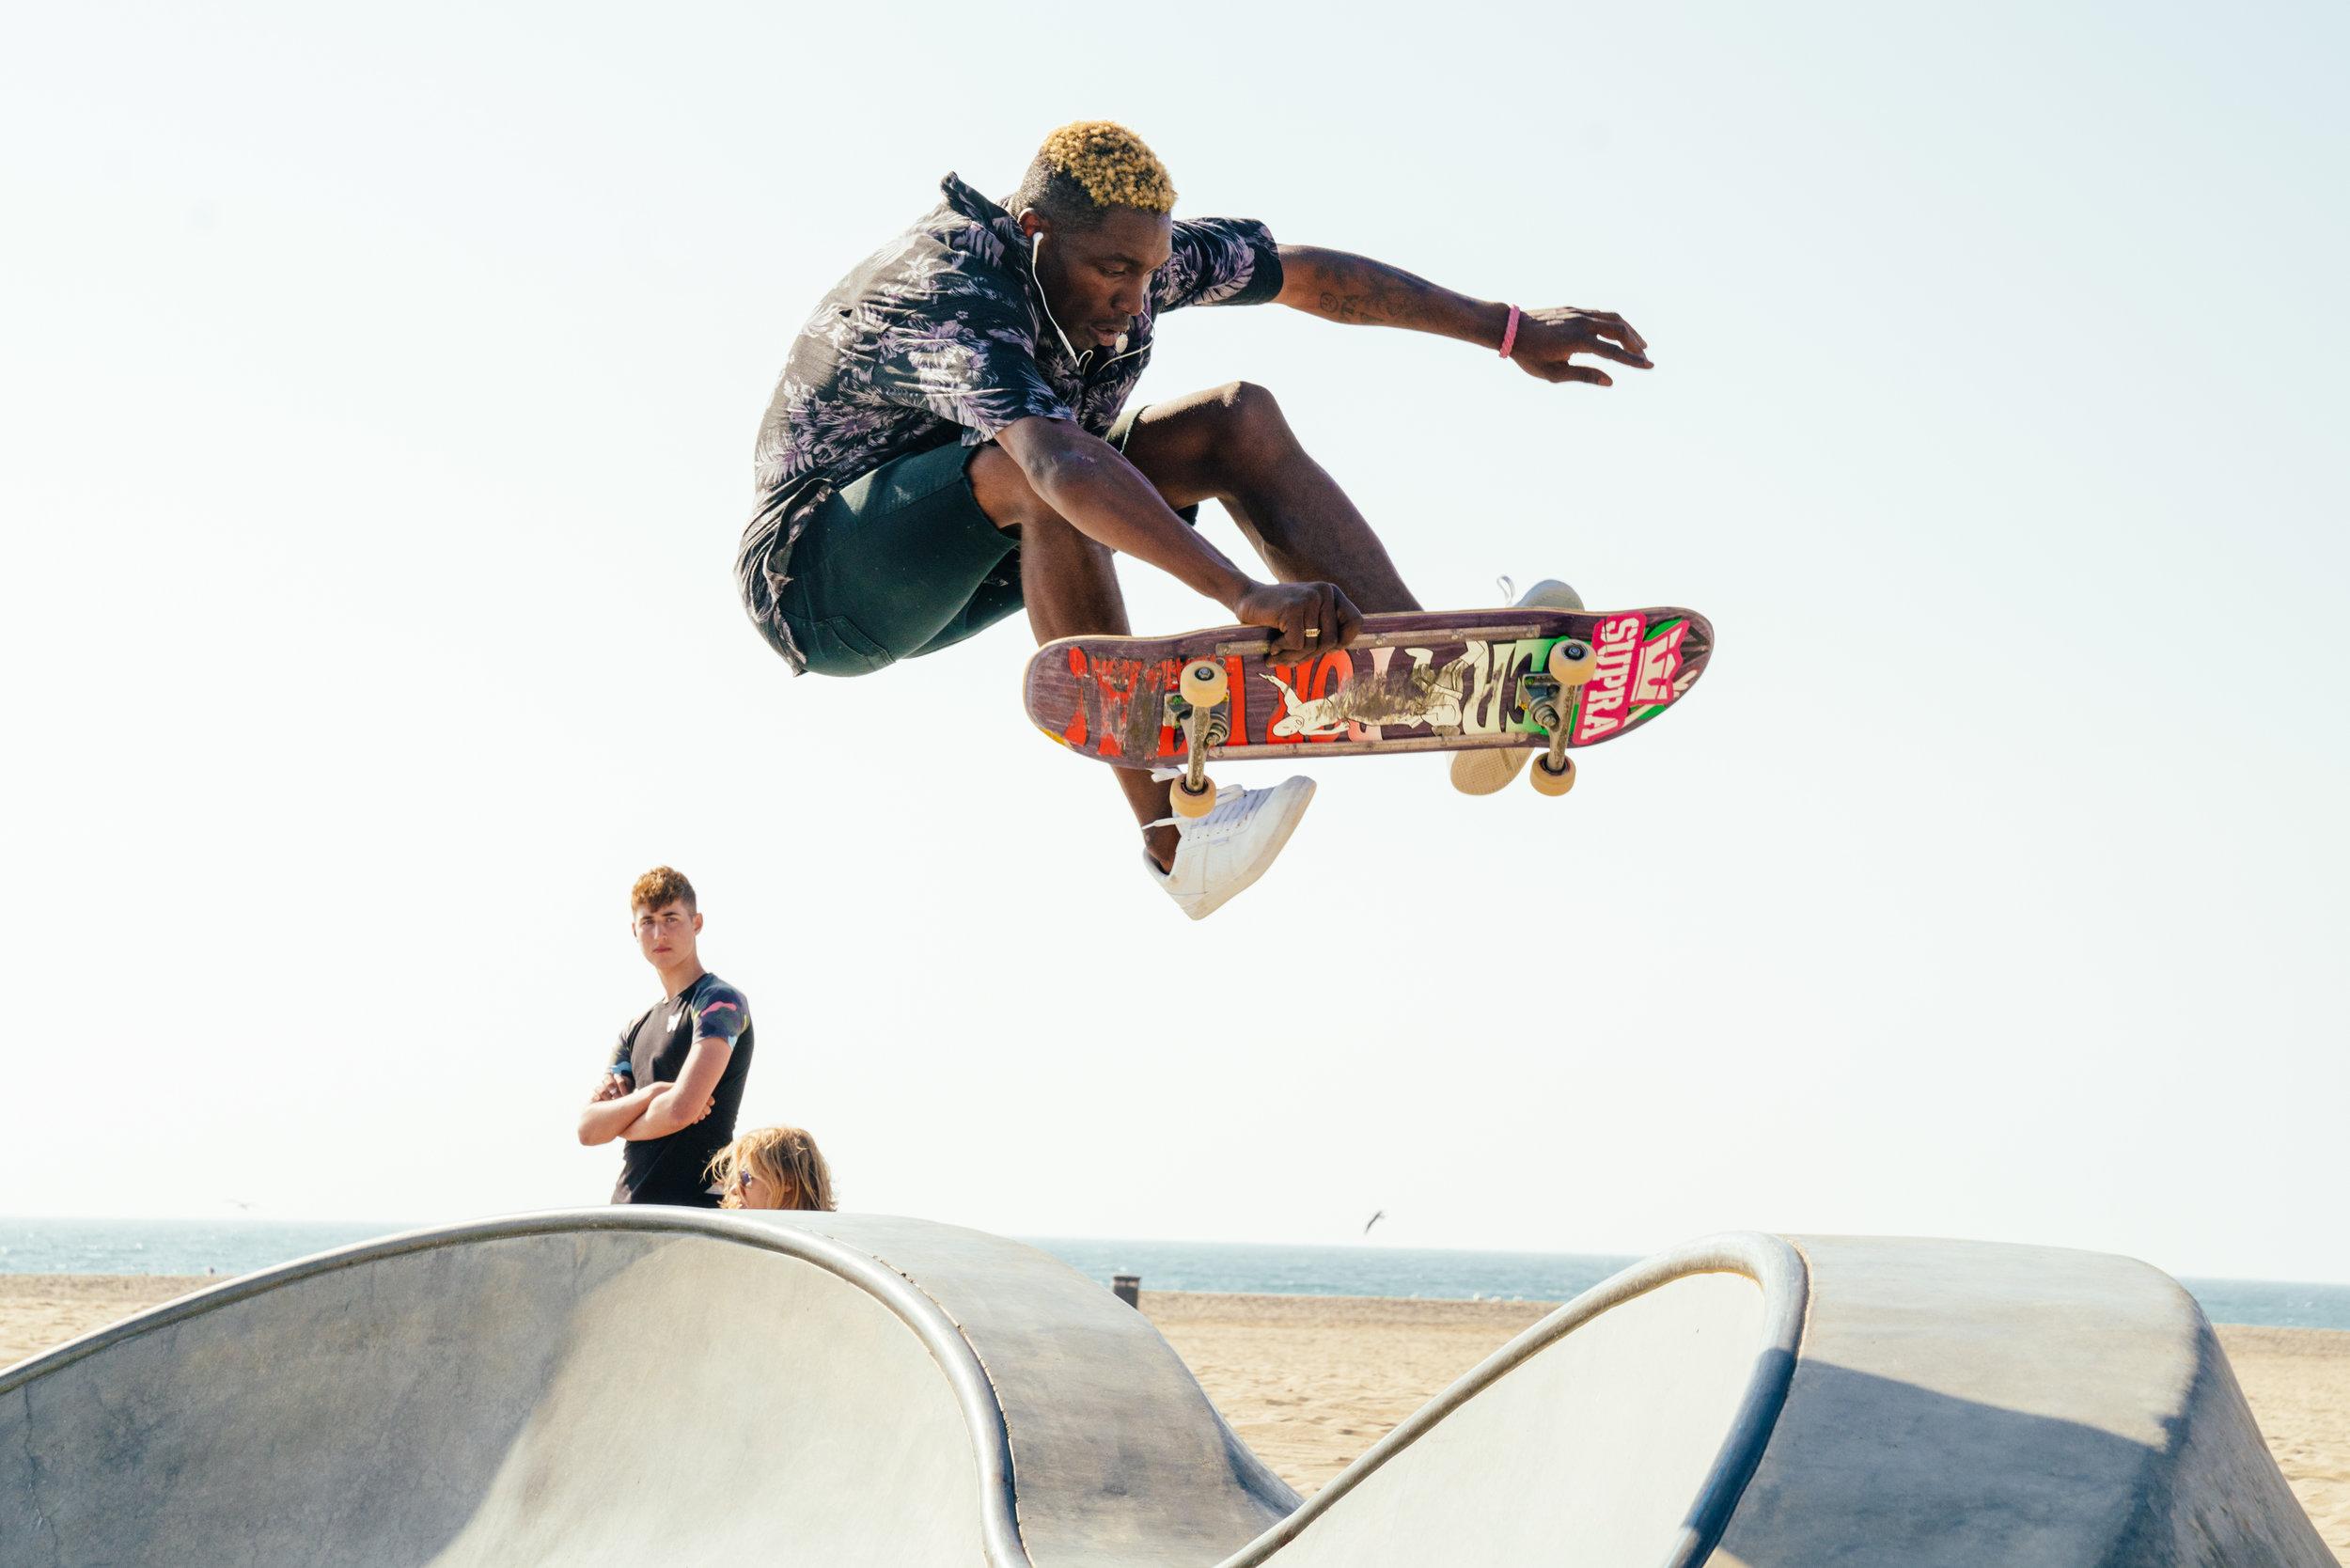 Skate Venice